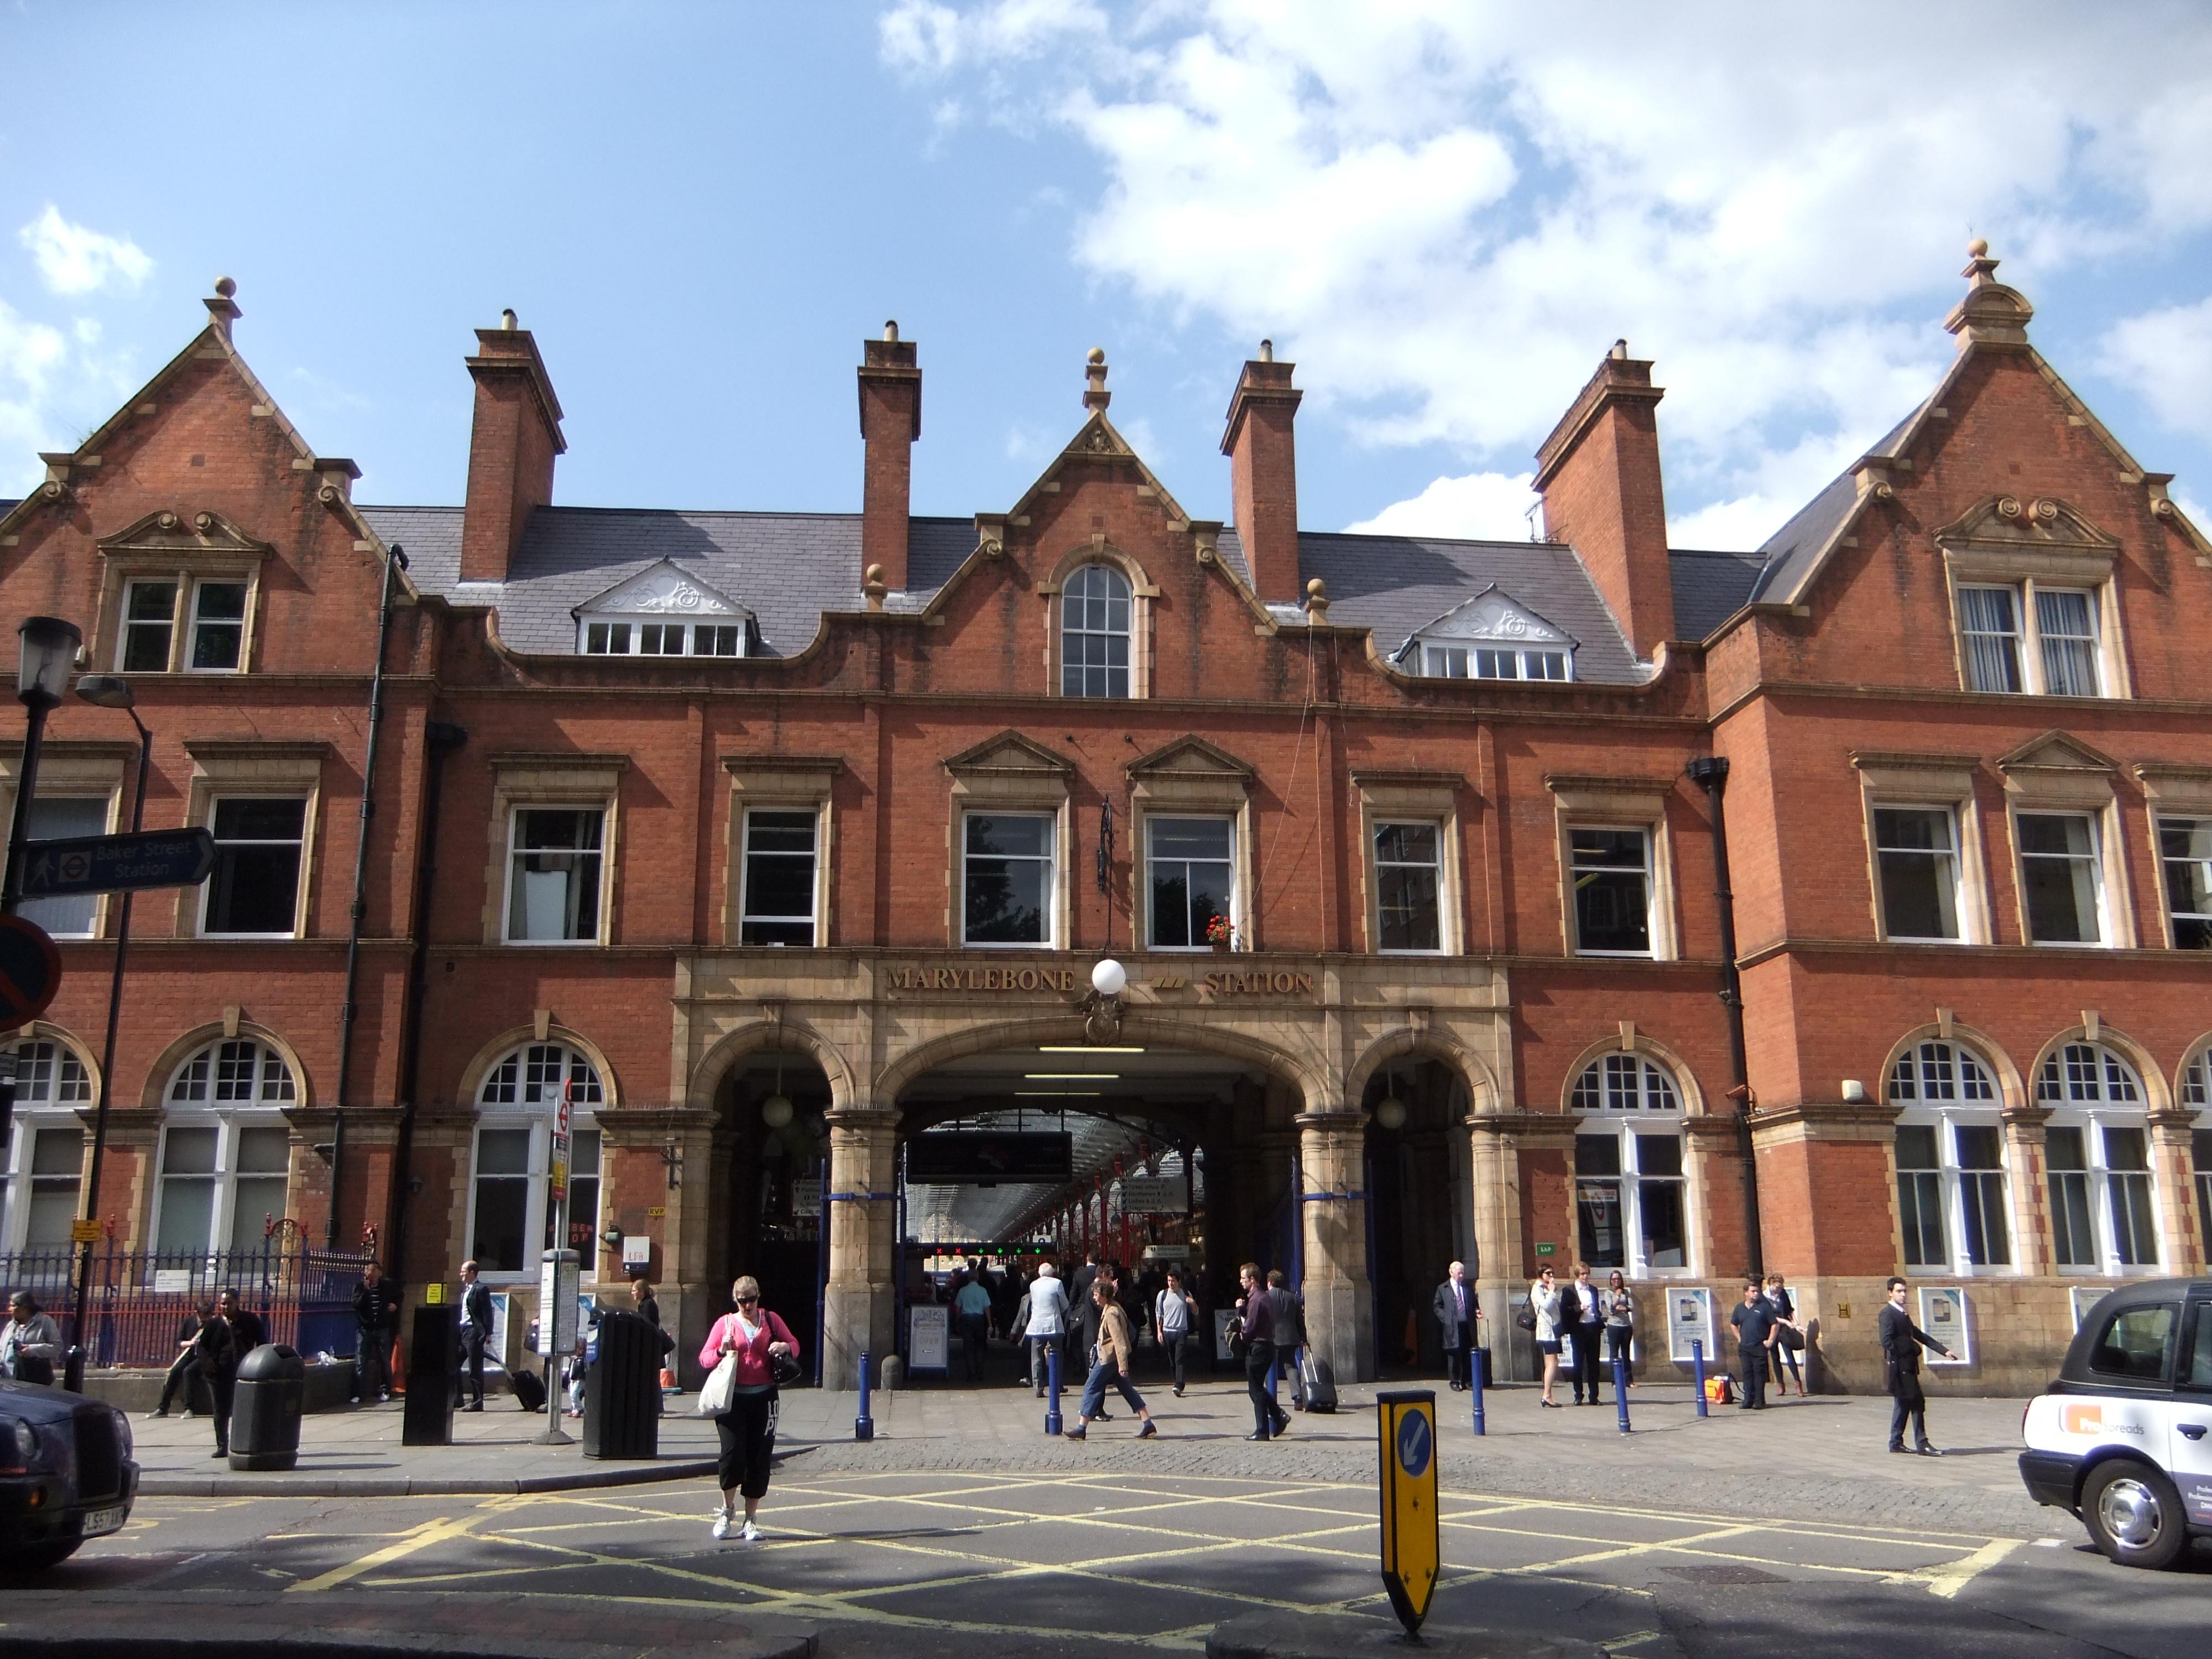 Marylebone station frontage - DSCF0473.JPG